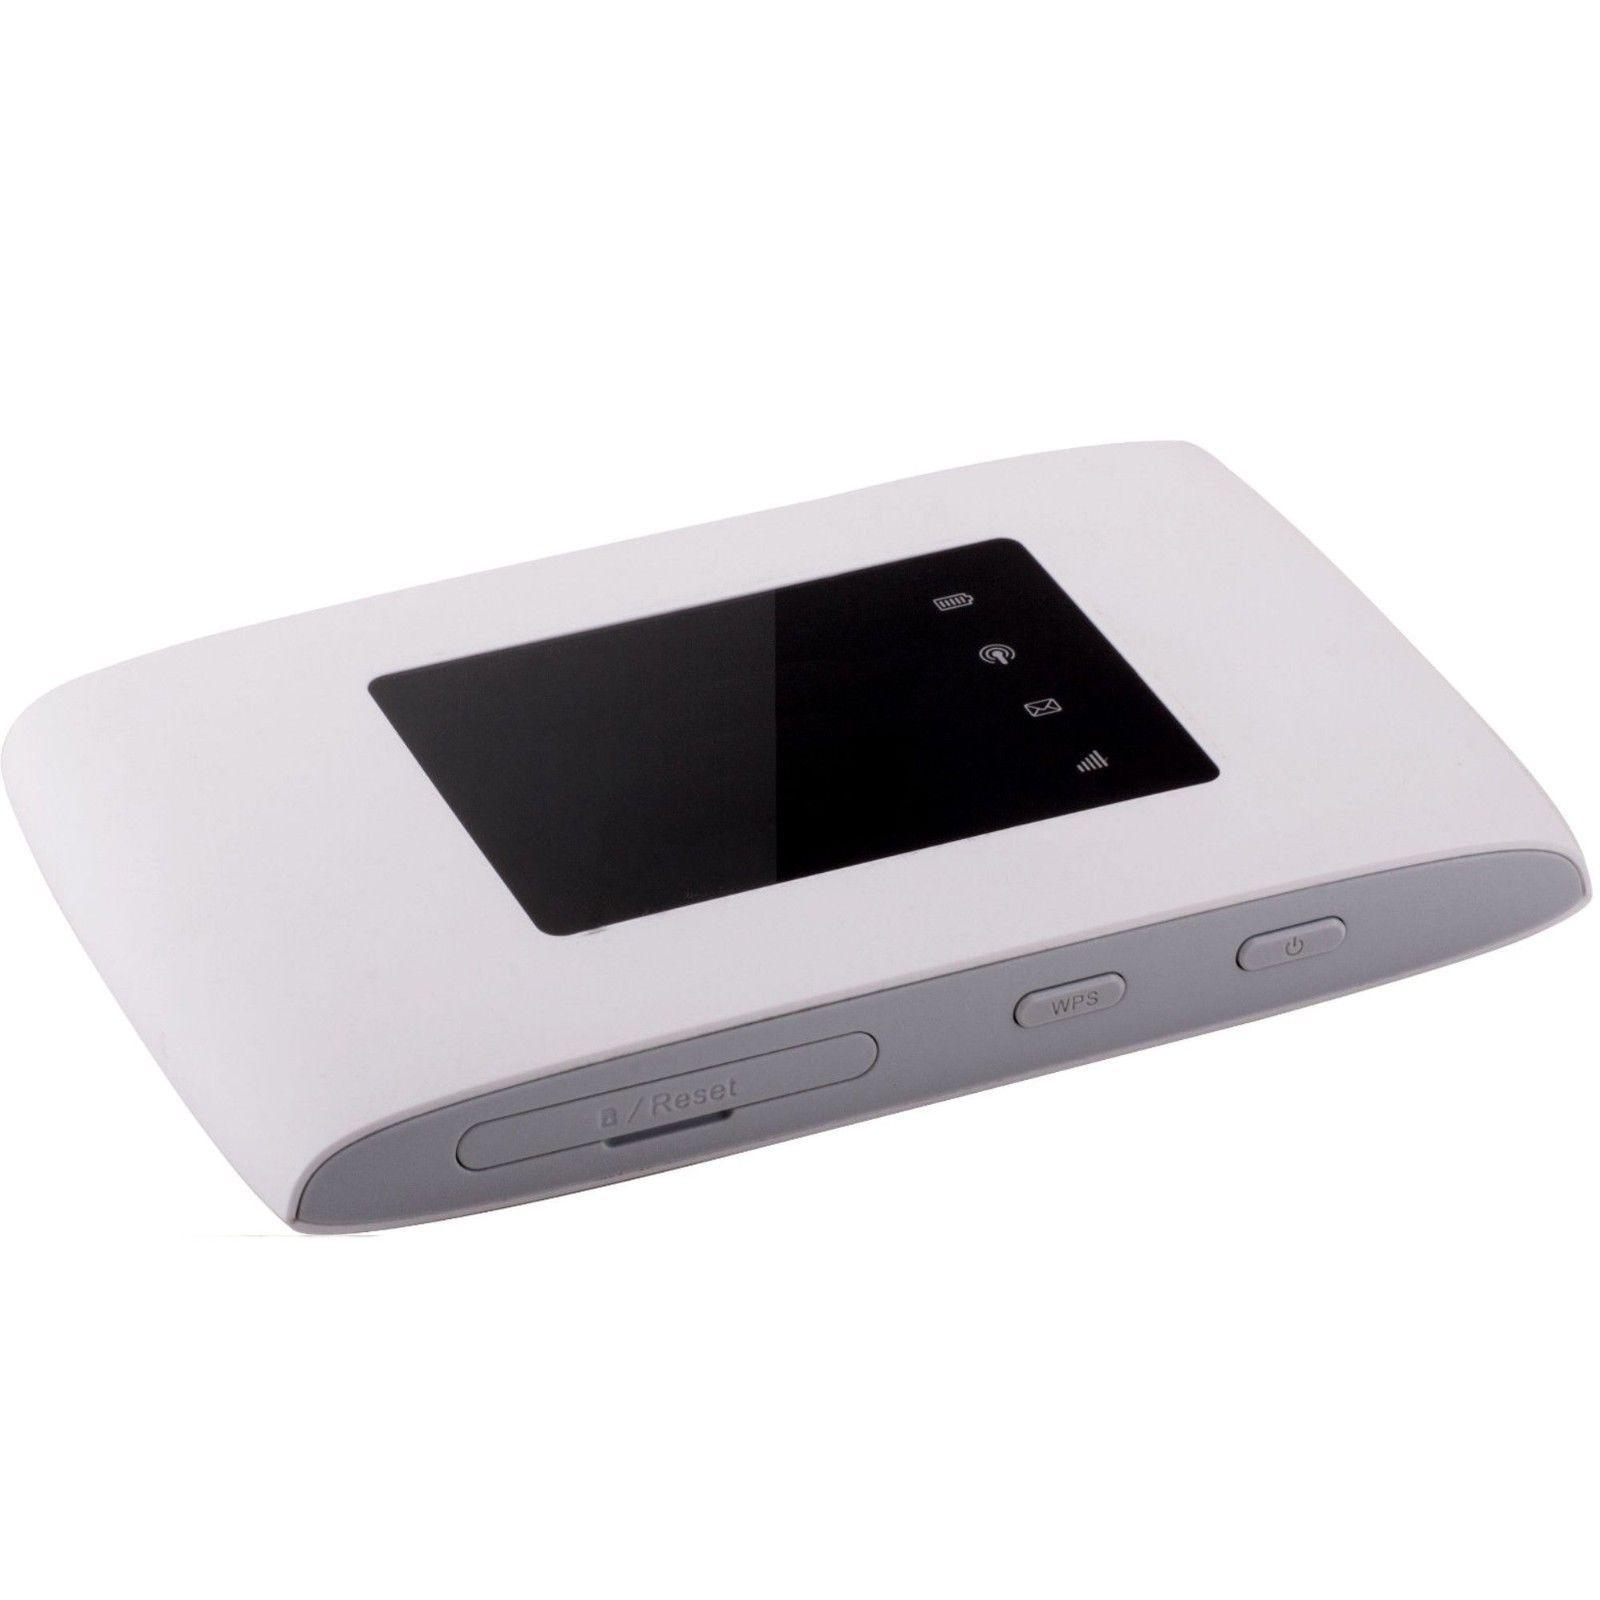 Mobile Broadband Devices 175710: Boost Mobile Zte Warp